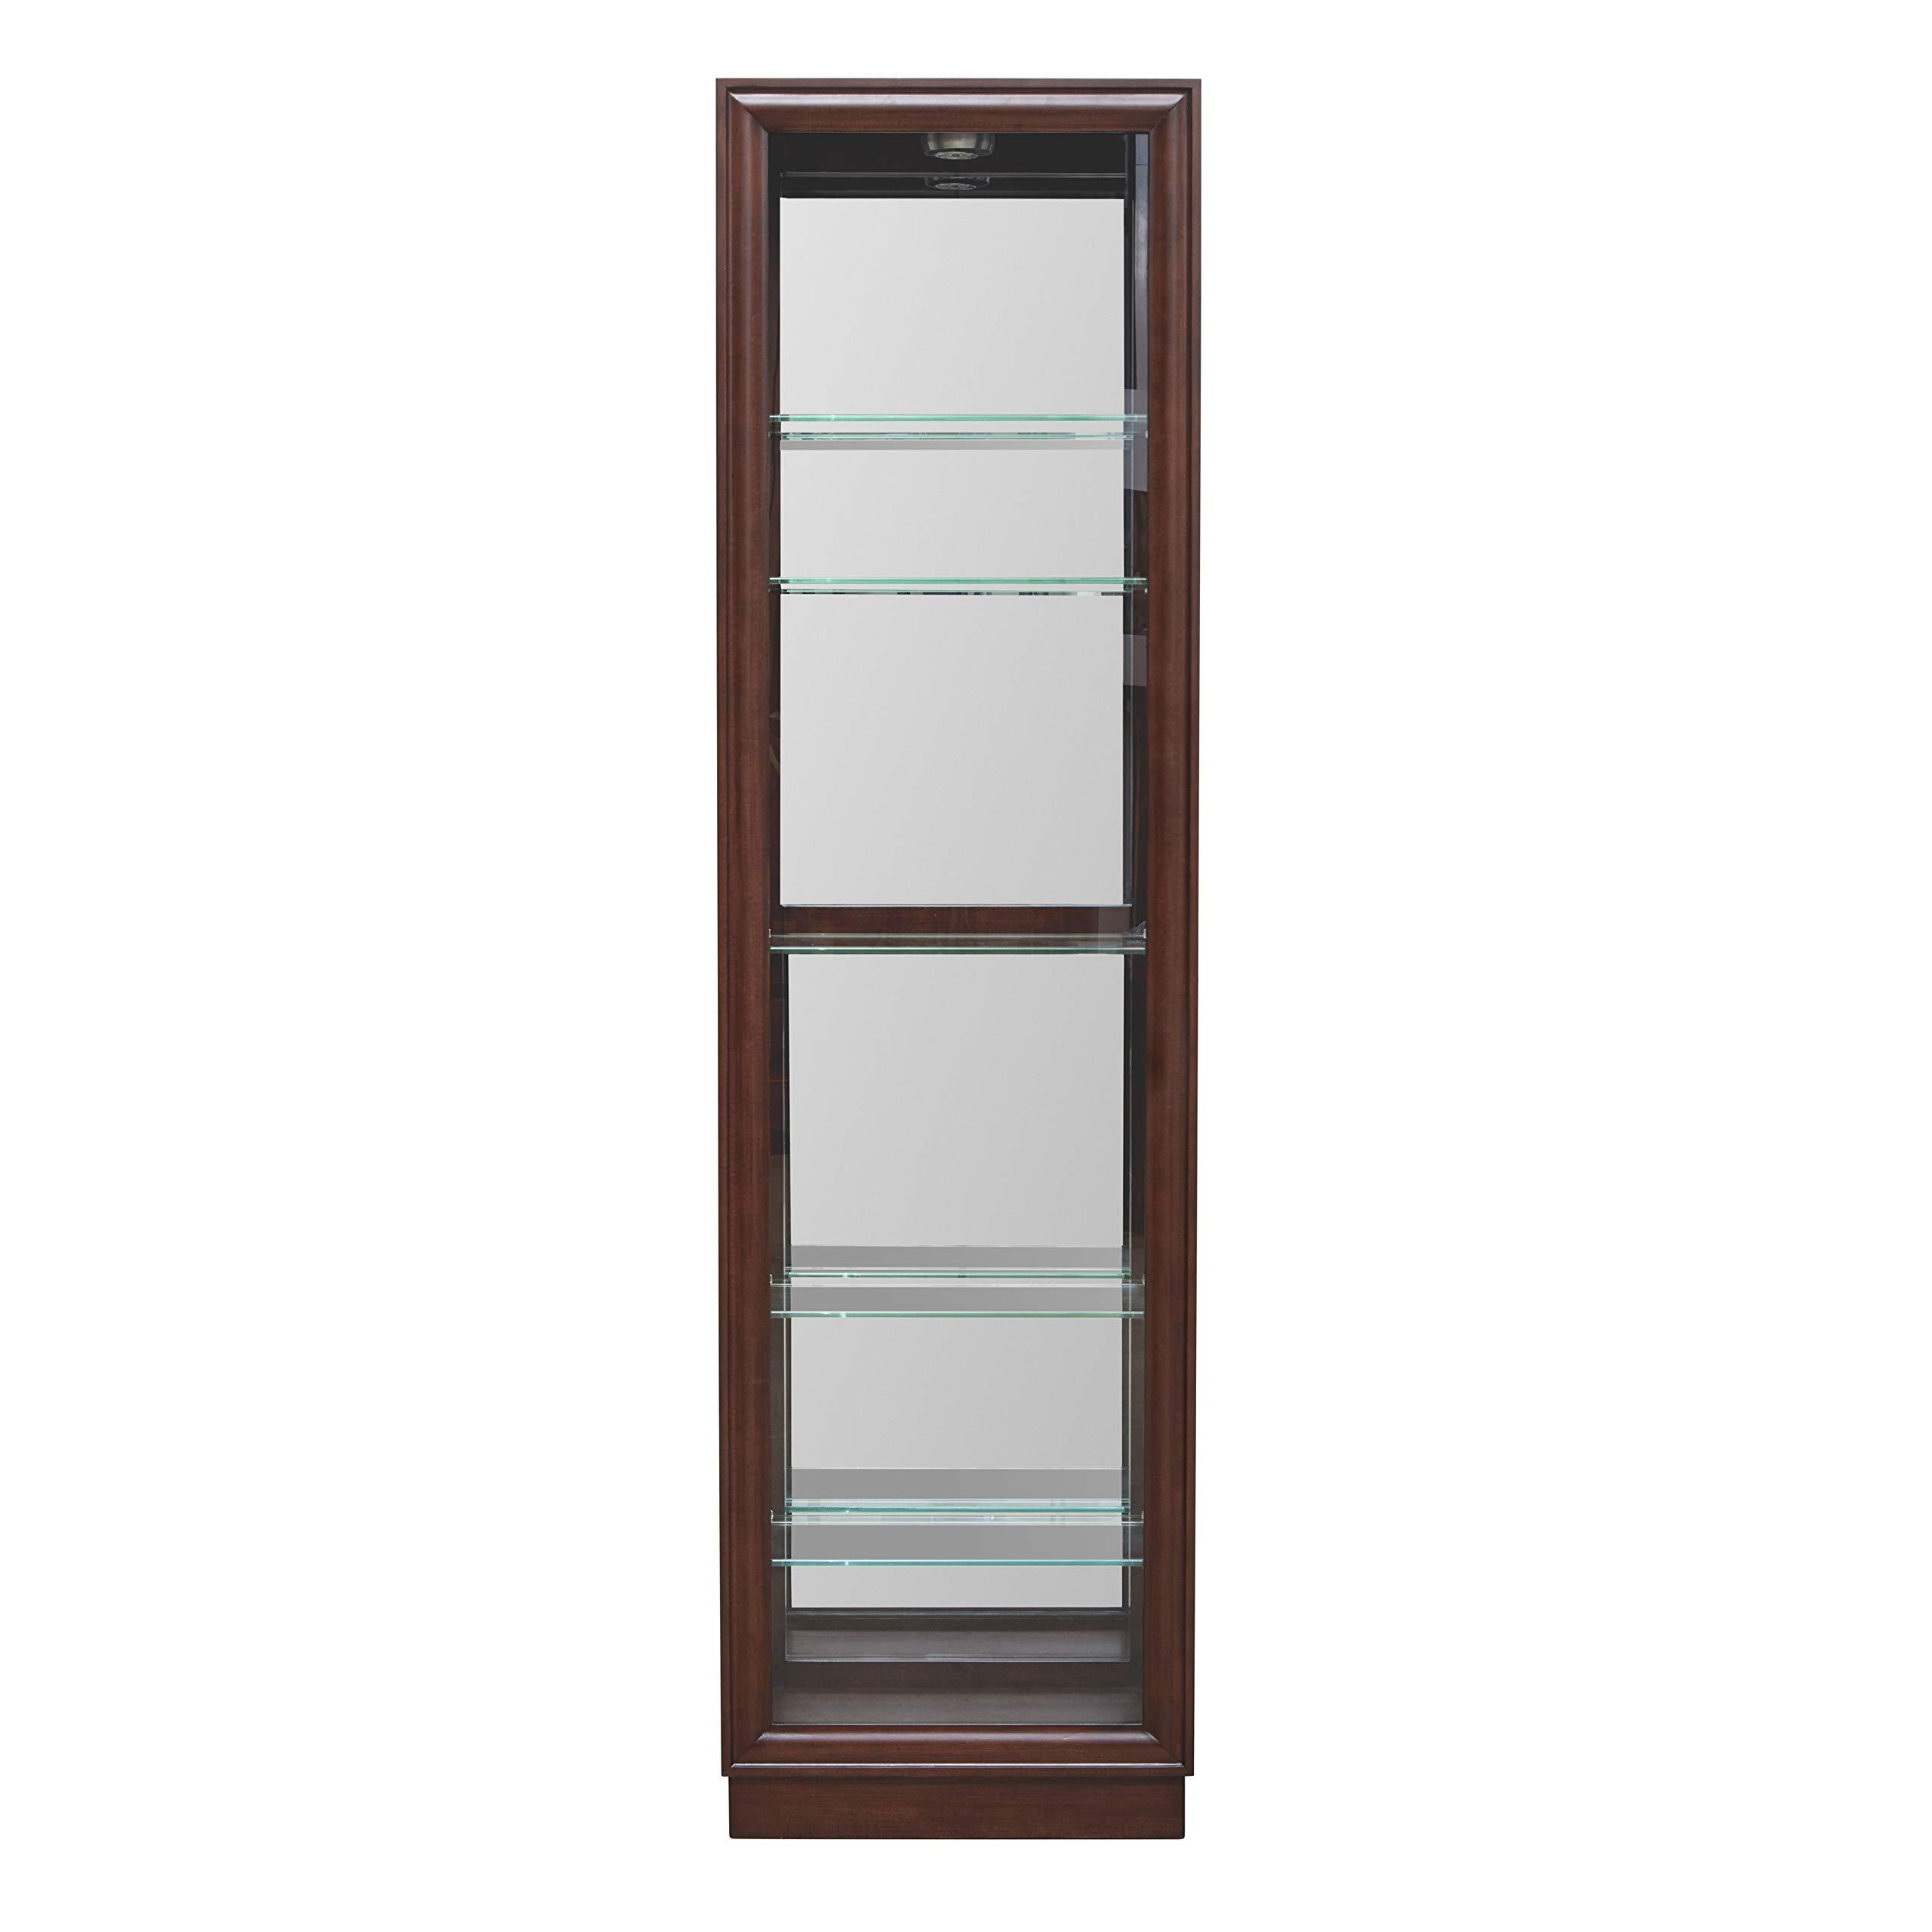 Pulaski  Side Entry Curio Display Cabinet, 21.0'' L x 11.0'' W x 77.0'' H, Cherry by Pulaski (Image #2)